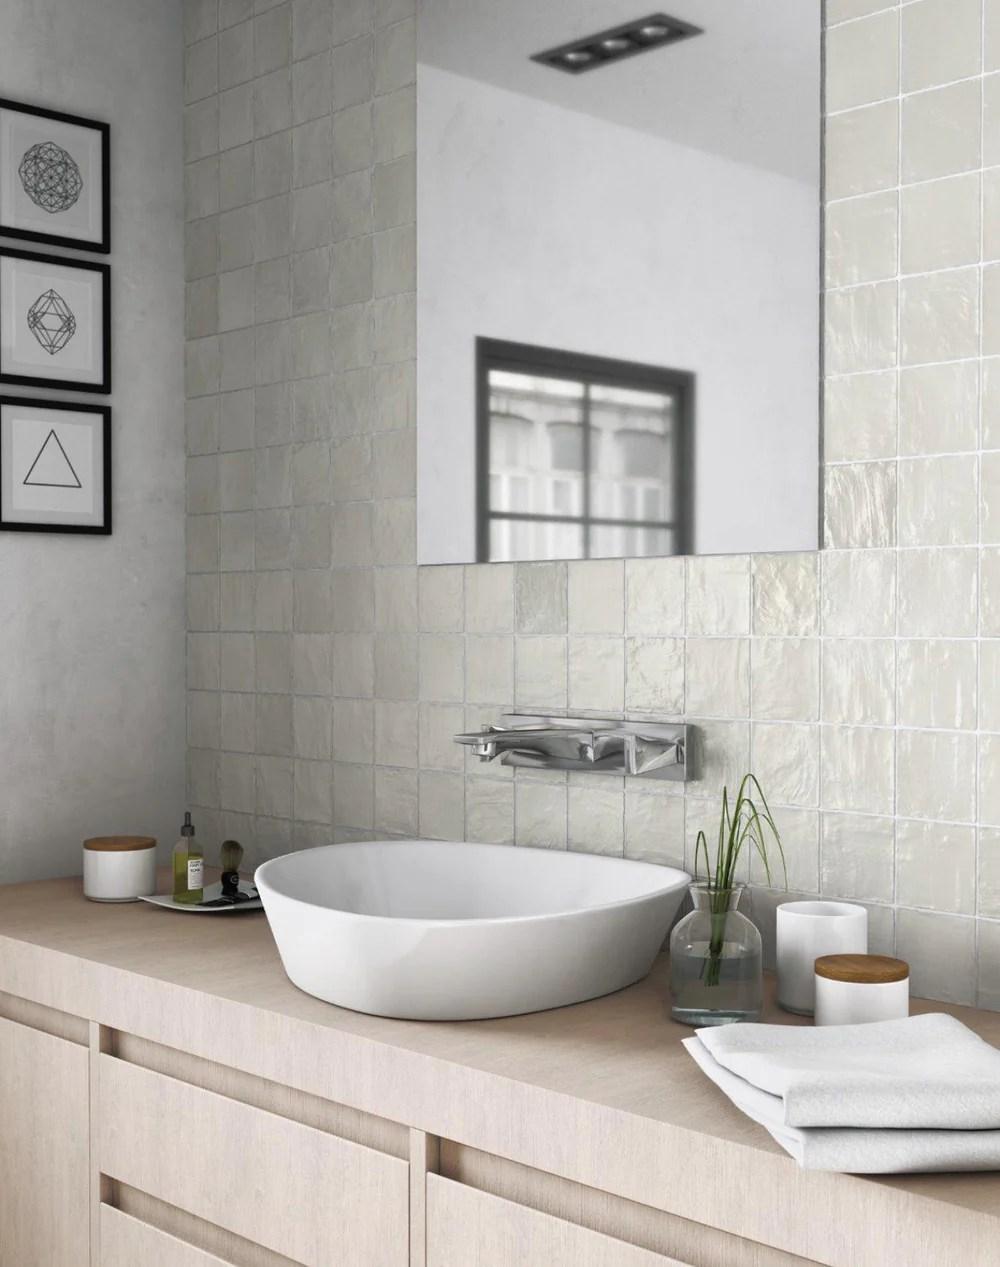 mallorca green ceramic tile 4x4